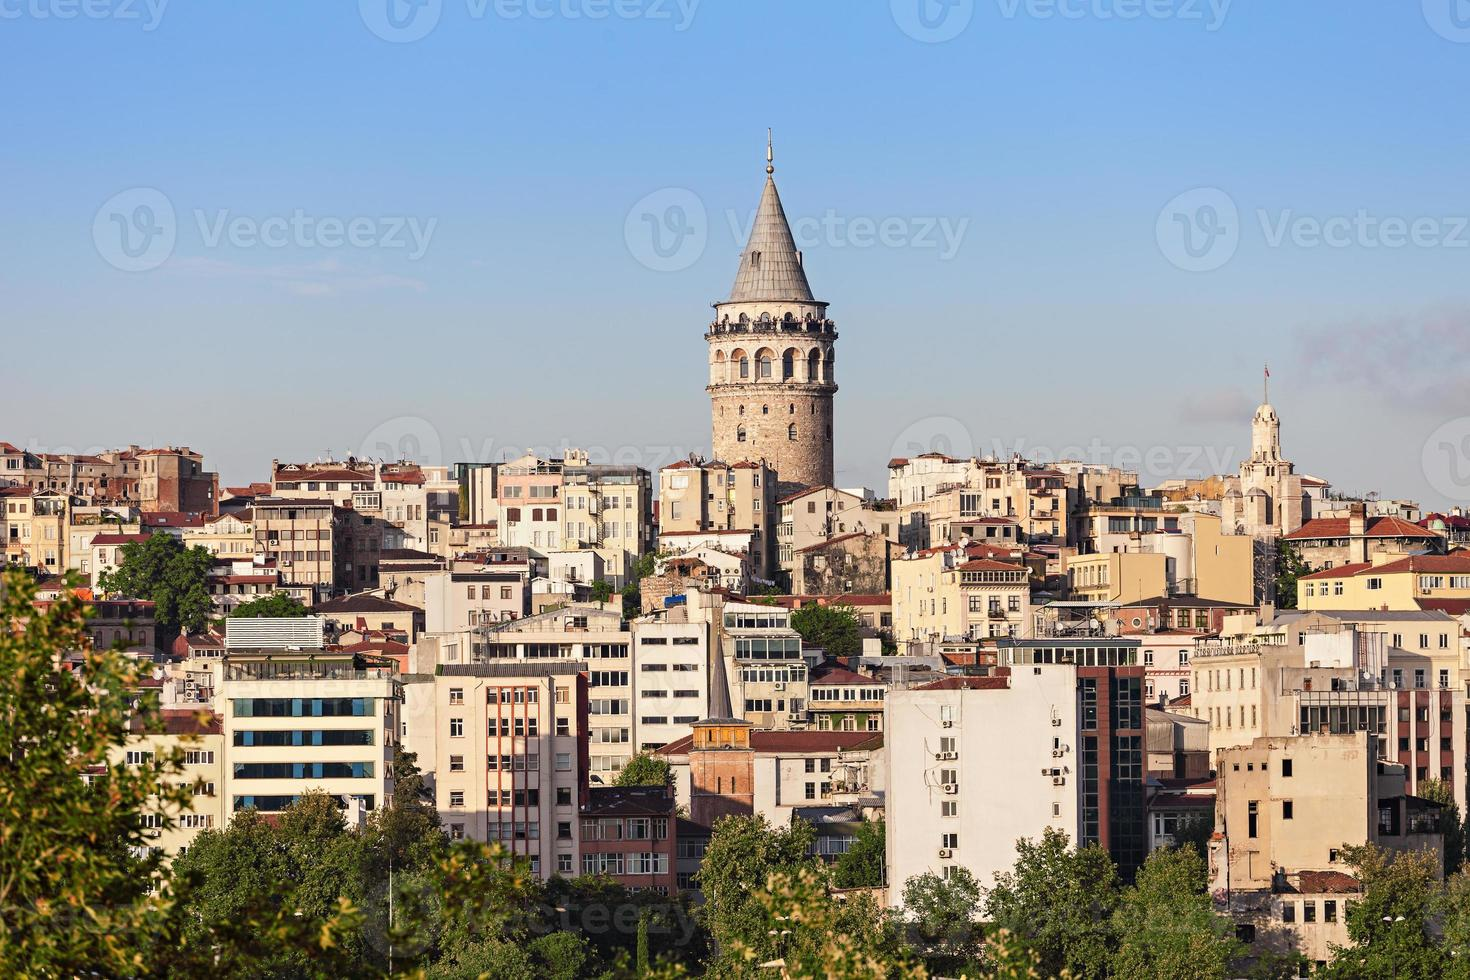 The Galata Tower photo